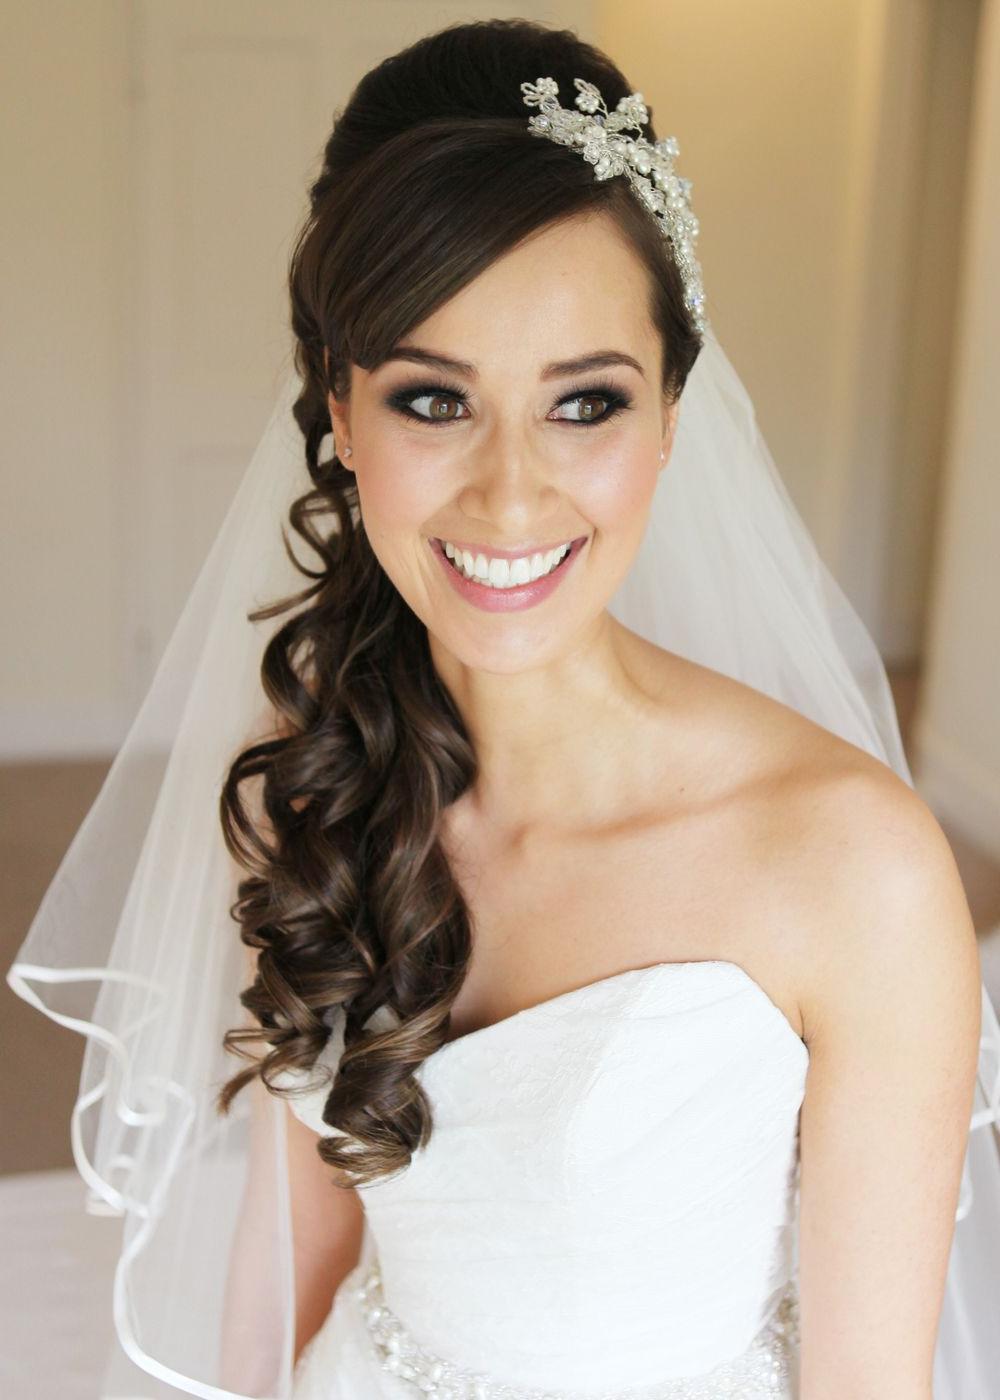 15 Fabulous Half Up Half Down Wedding Hairstyles (Gallery 9 of 20)